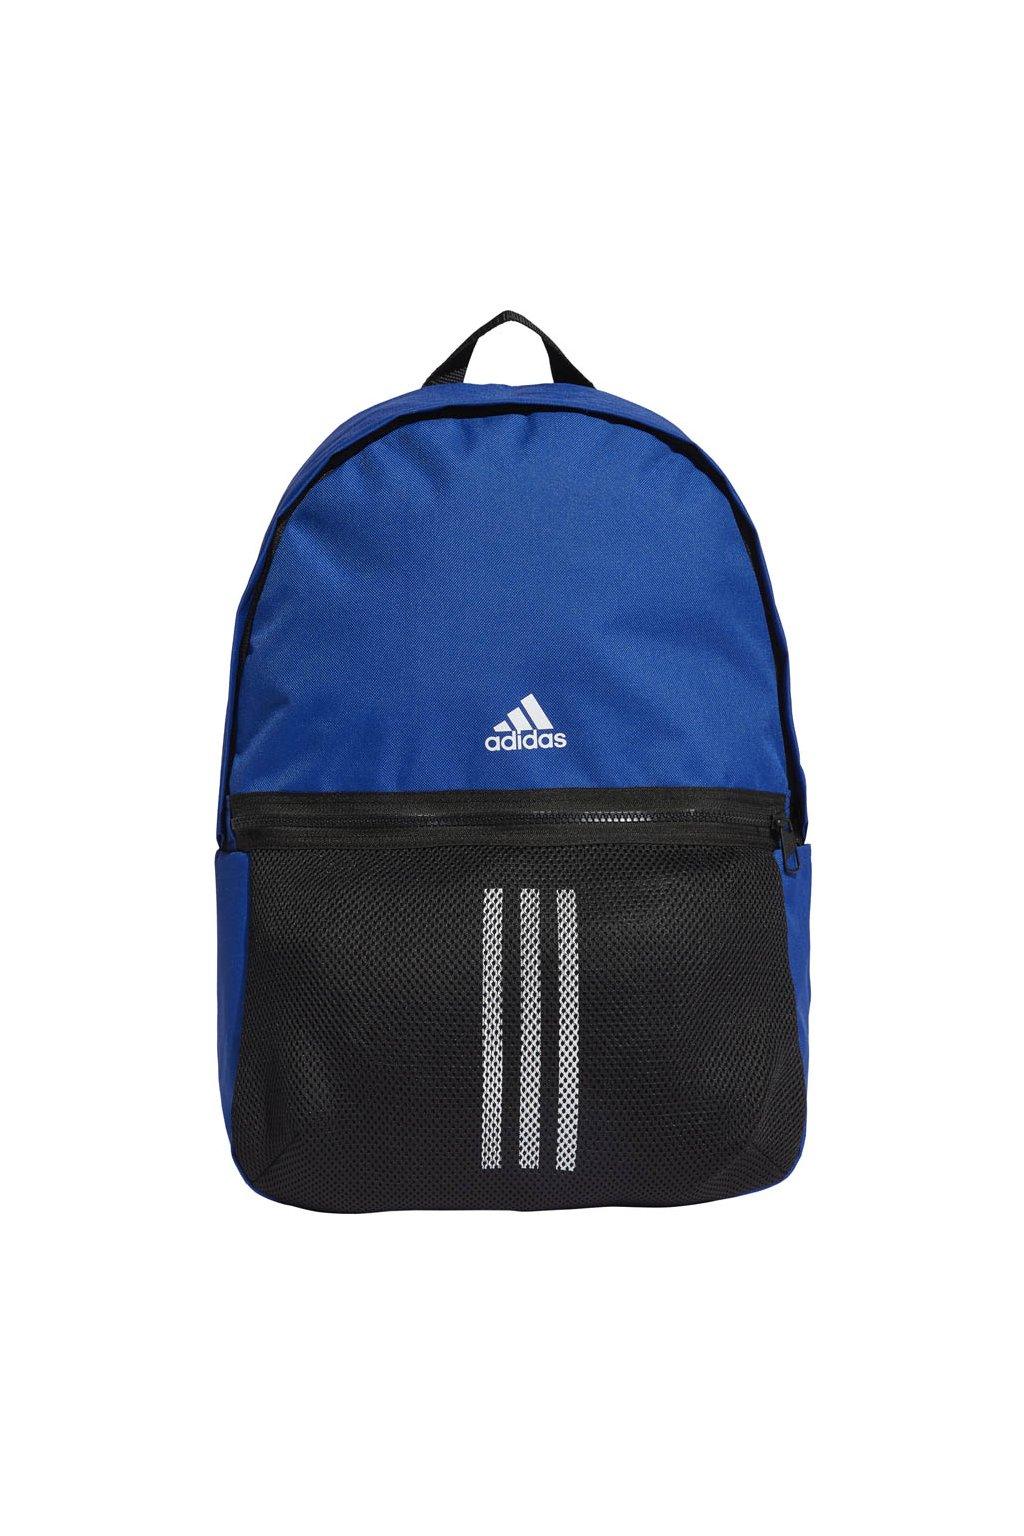 Batoh adidas Classic Backpack 3S modro-čierny GD5652